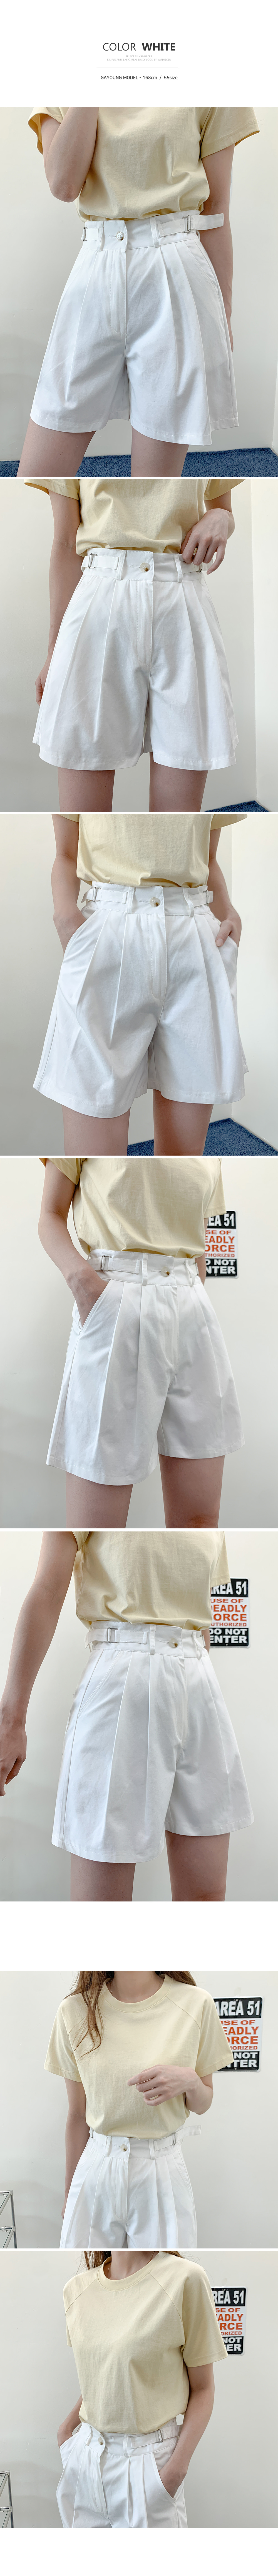 Modern Half Pintuck Cotton Buckle Slacks Bermuda Shorts P#YW648